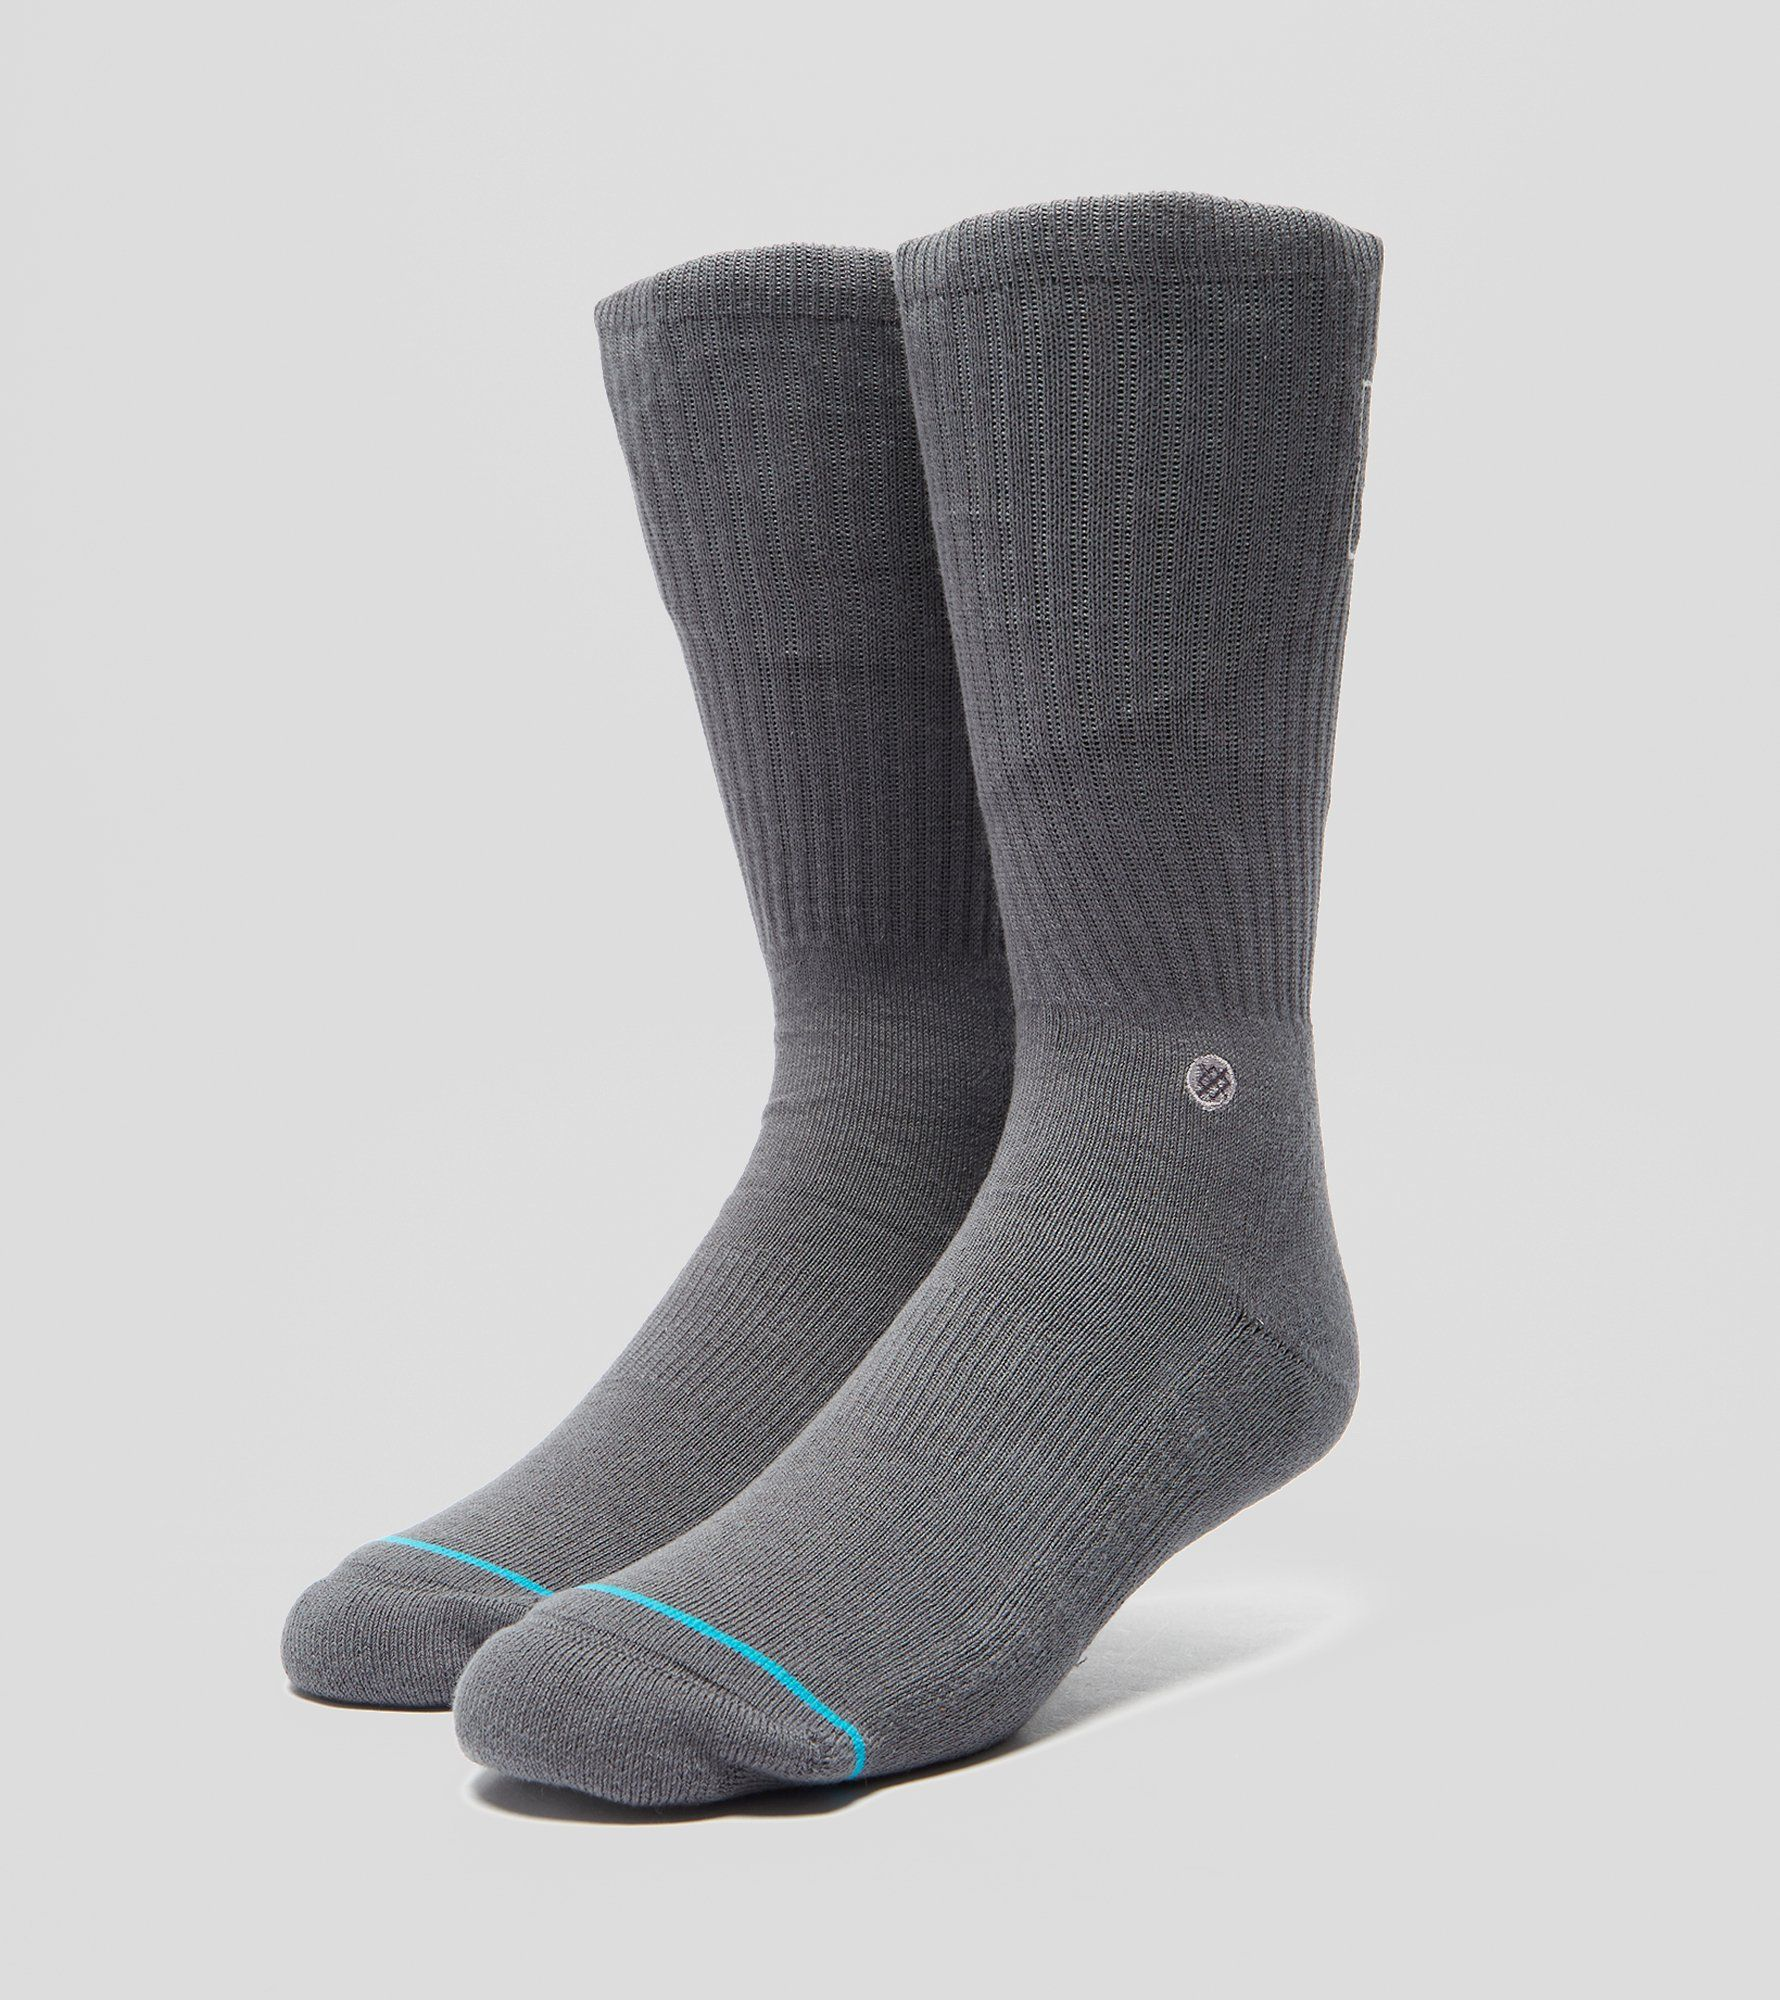 Carhartt WIP x Stance C.O. Socks